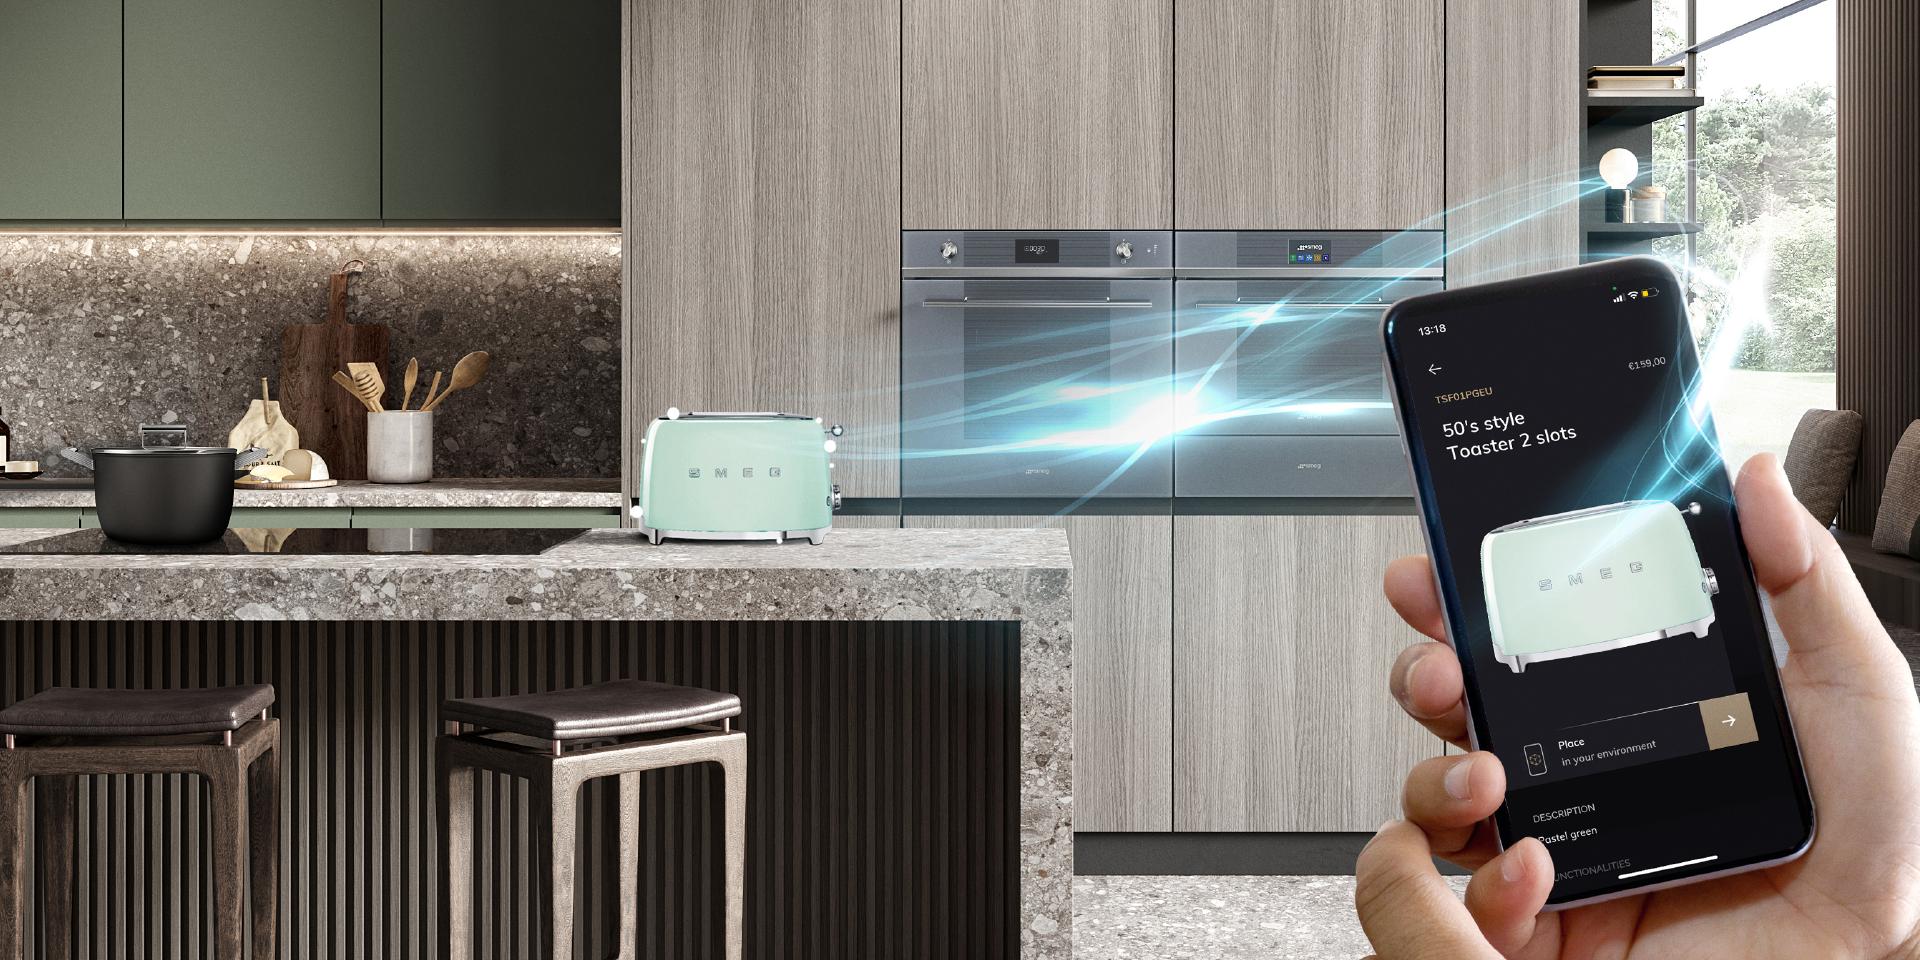 Ontdek nu je favoriete Smeg toestellen in augmented reality